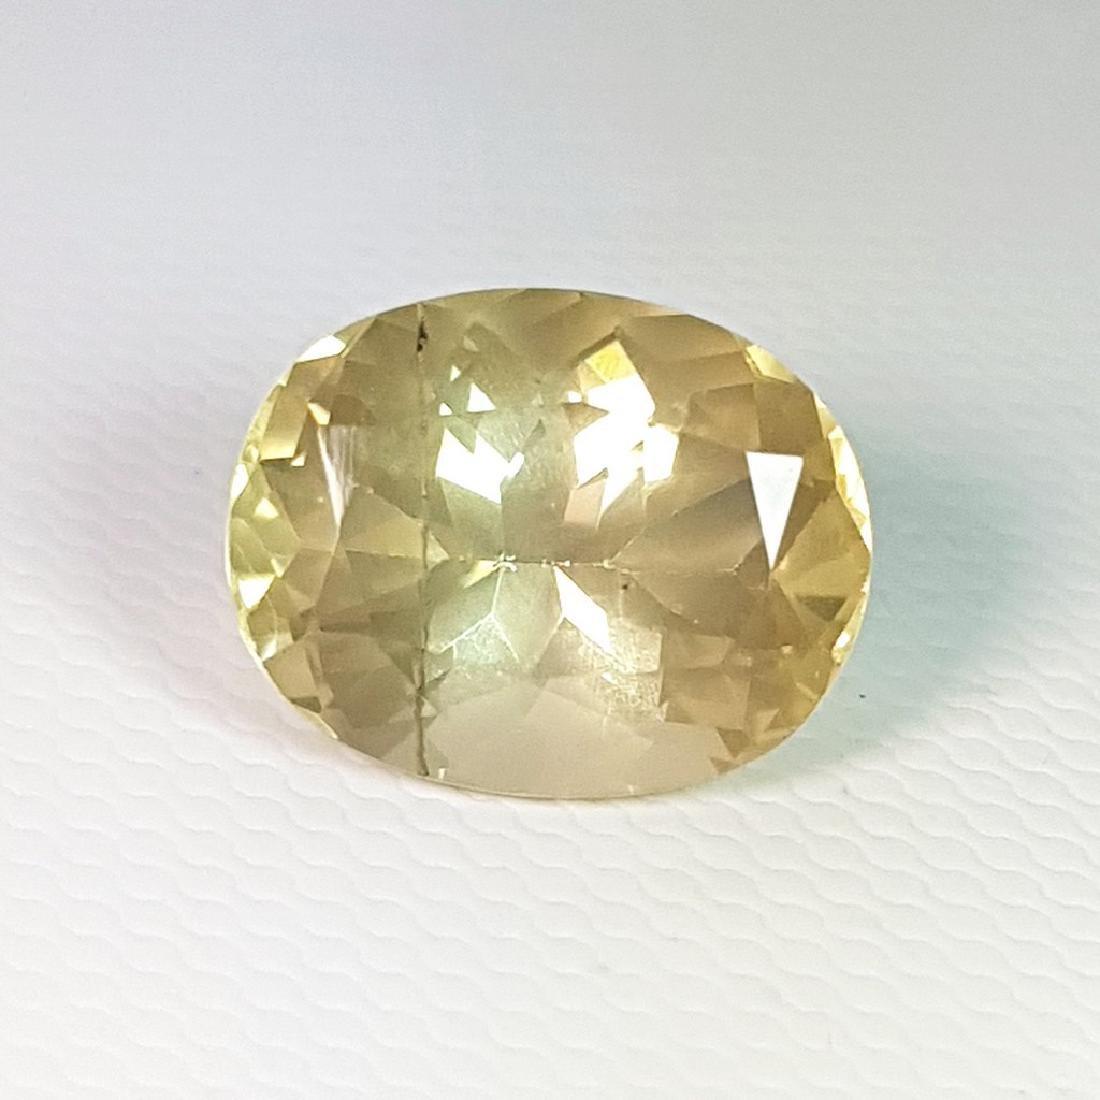 Andesine/Sun Stone - 5.01 ct